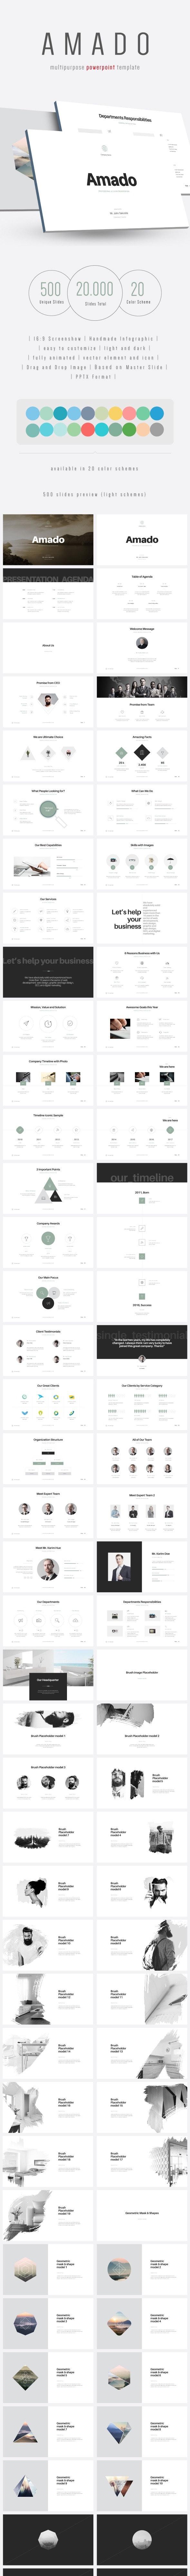 Amado - Multipurpose PowerPoint Template (V.24) - PowerPoint Templates Presentation Templates